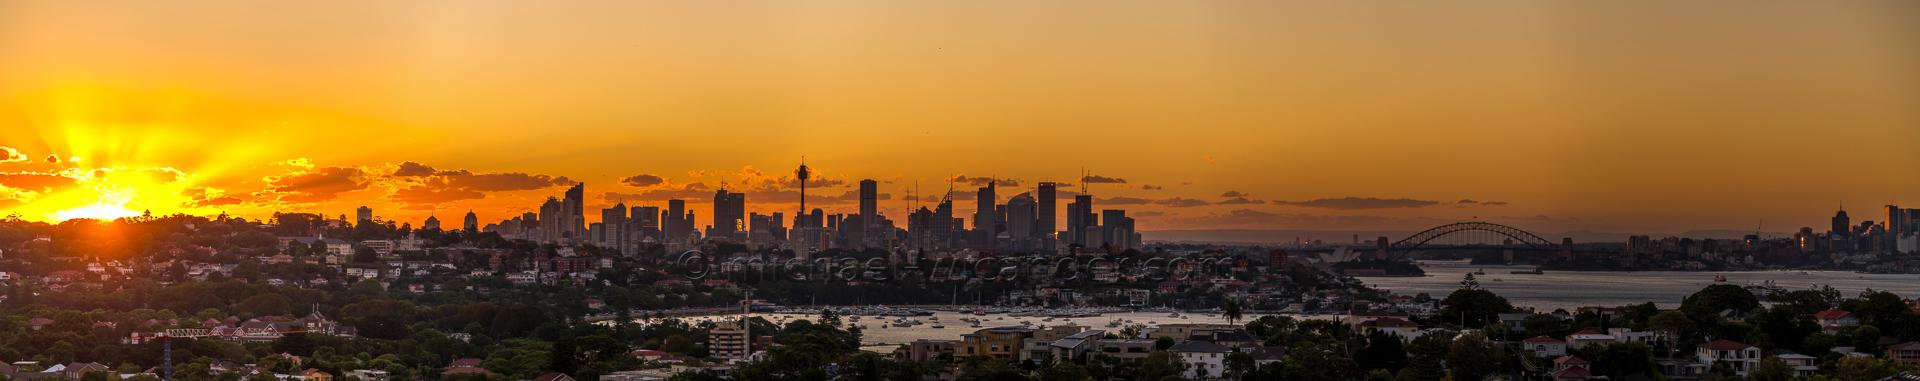 Sydney Skyline Panorama 19 04